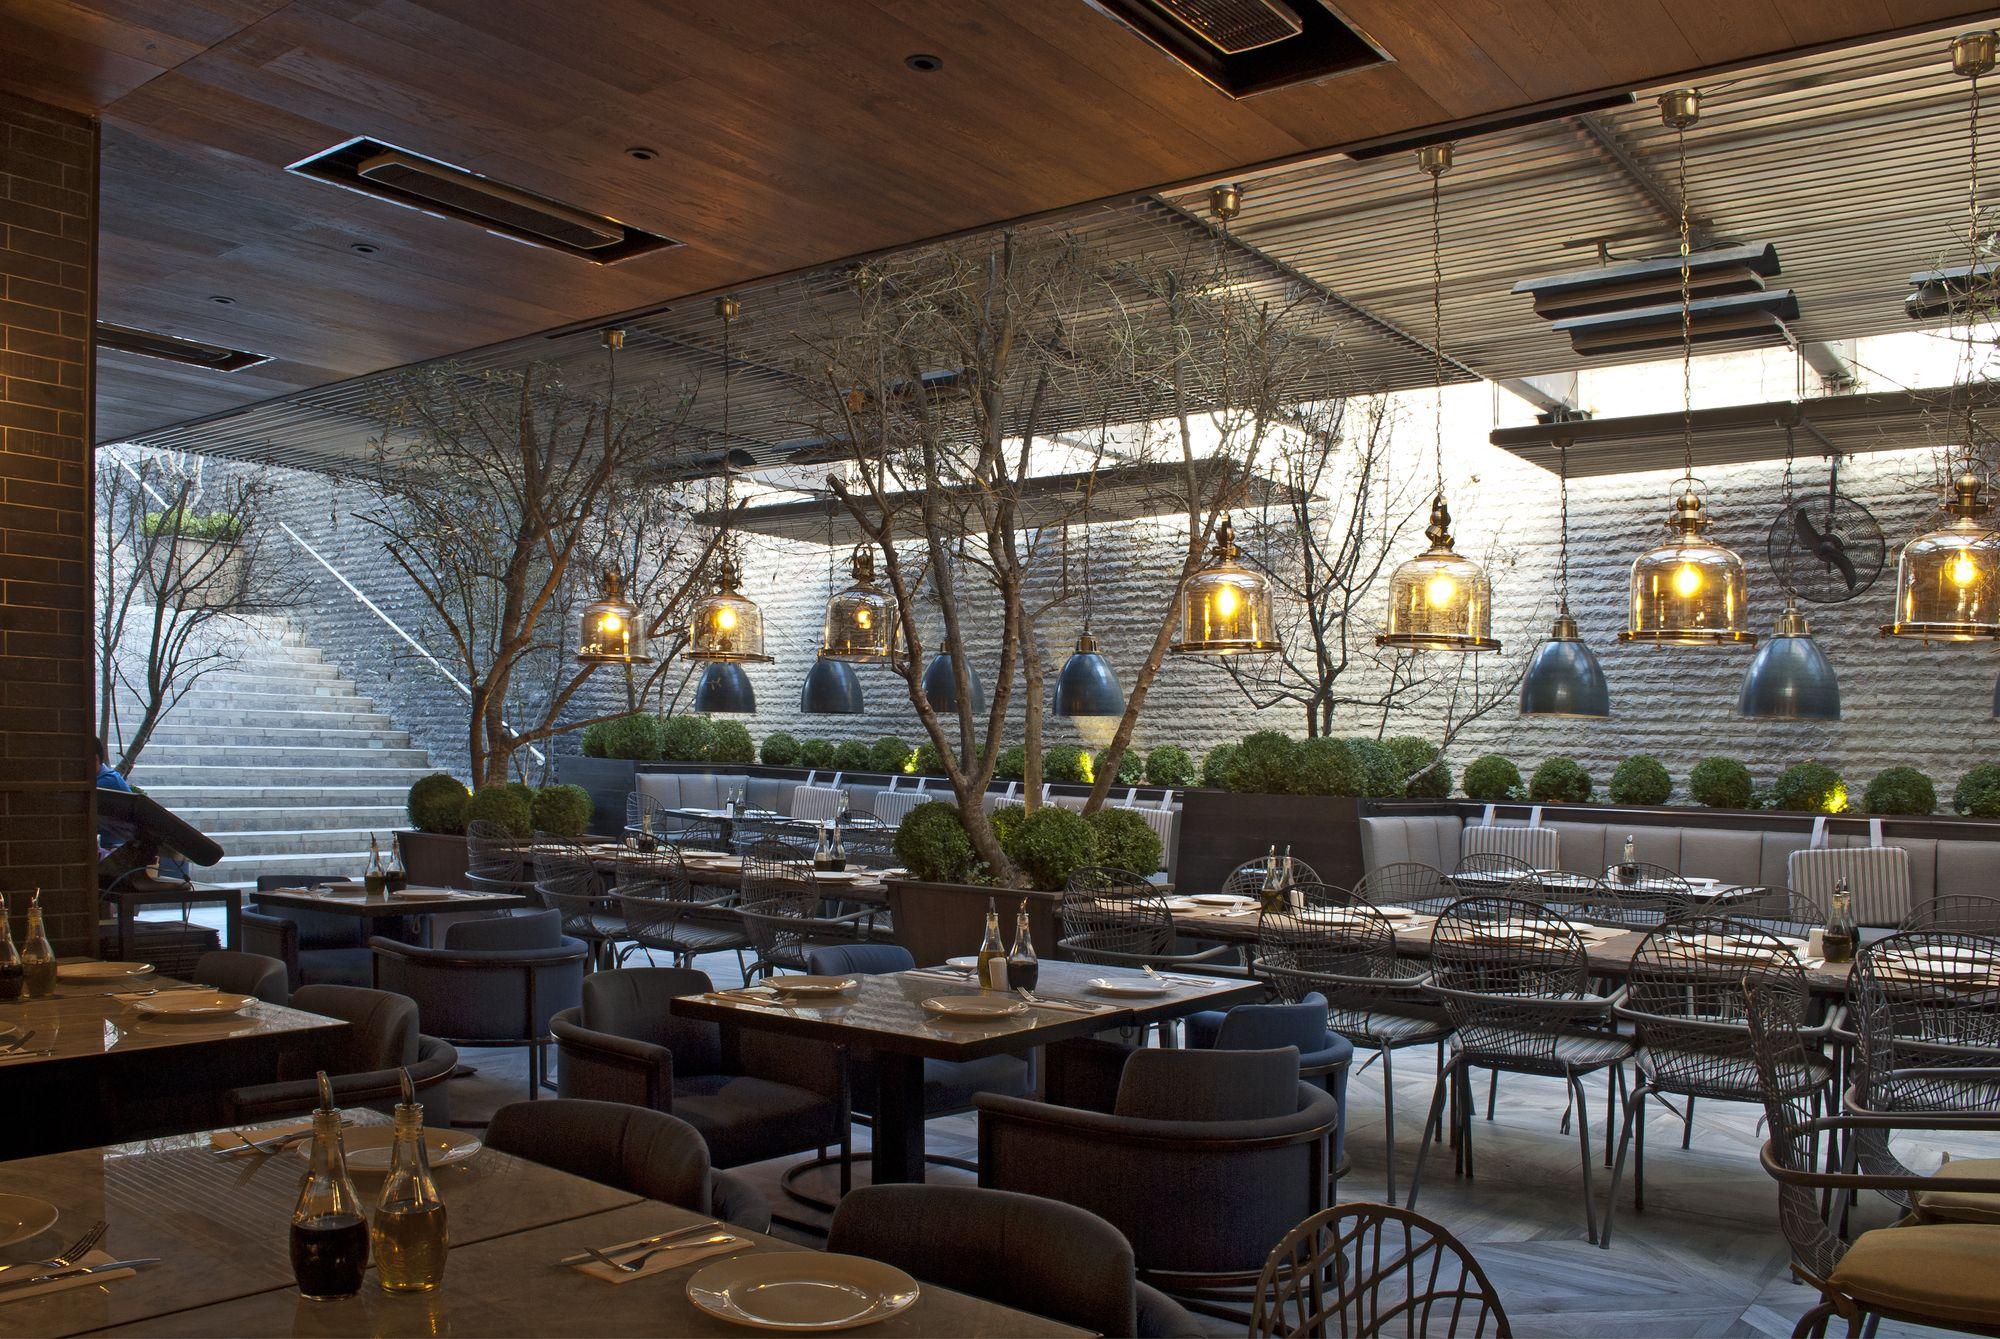 Restaurante Margo Isidora Goyenechea Lira Y Tuckerman Arquitectos Sebastian Larroulet Restaurantes Arquitectos Arquitectura